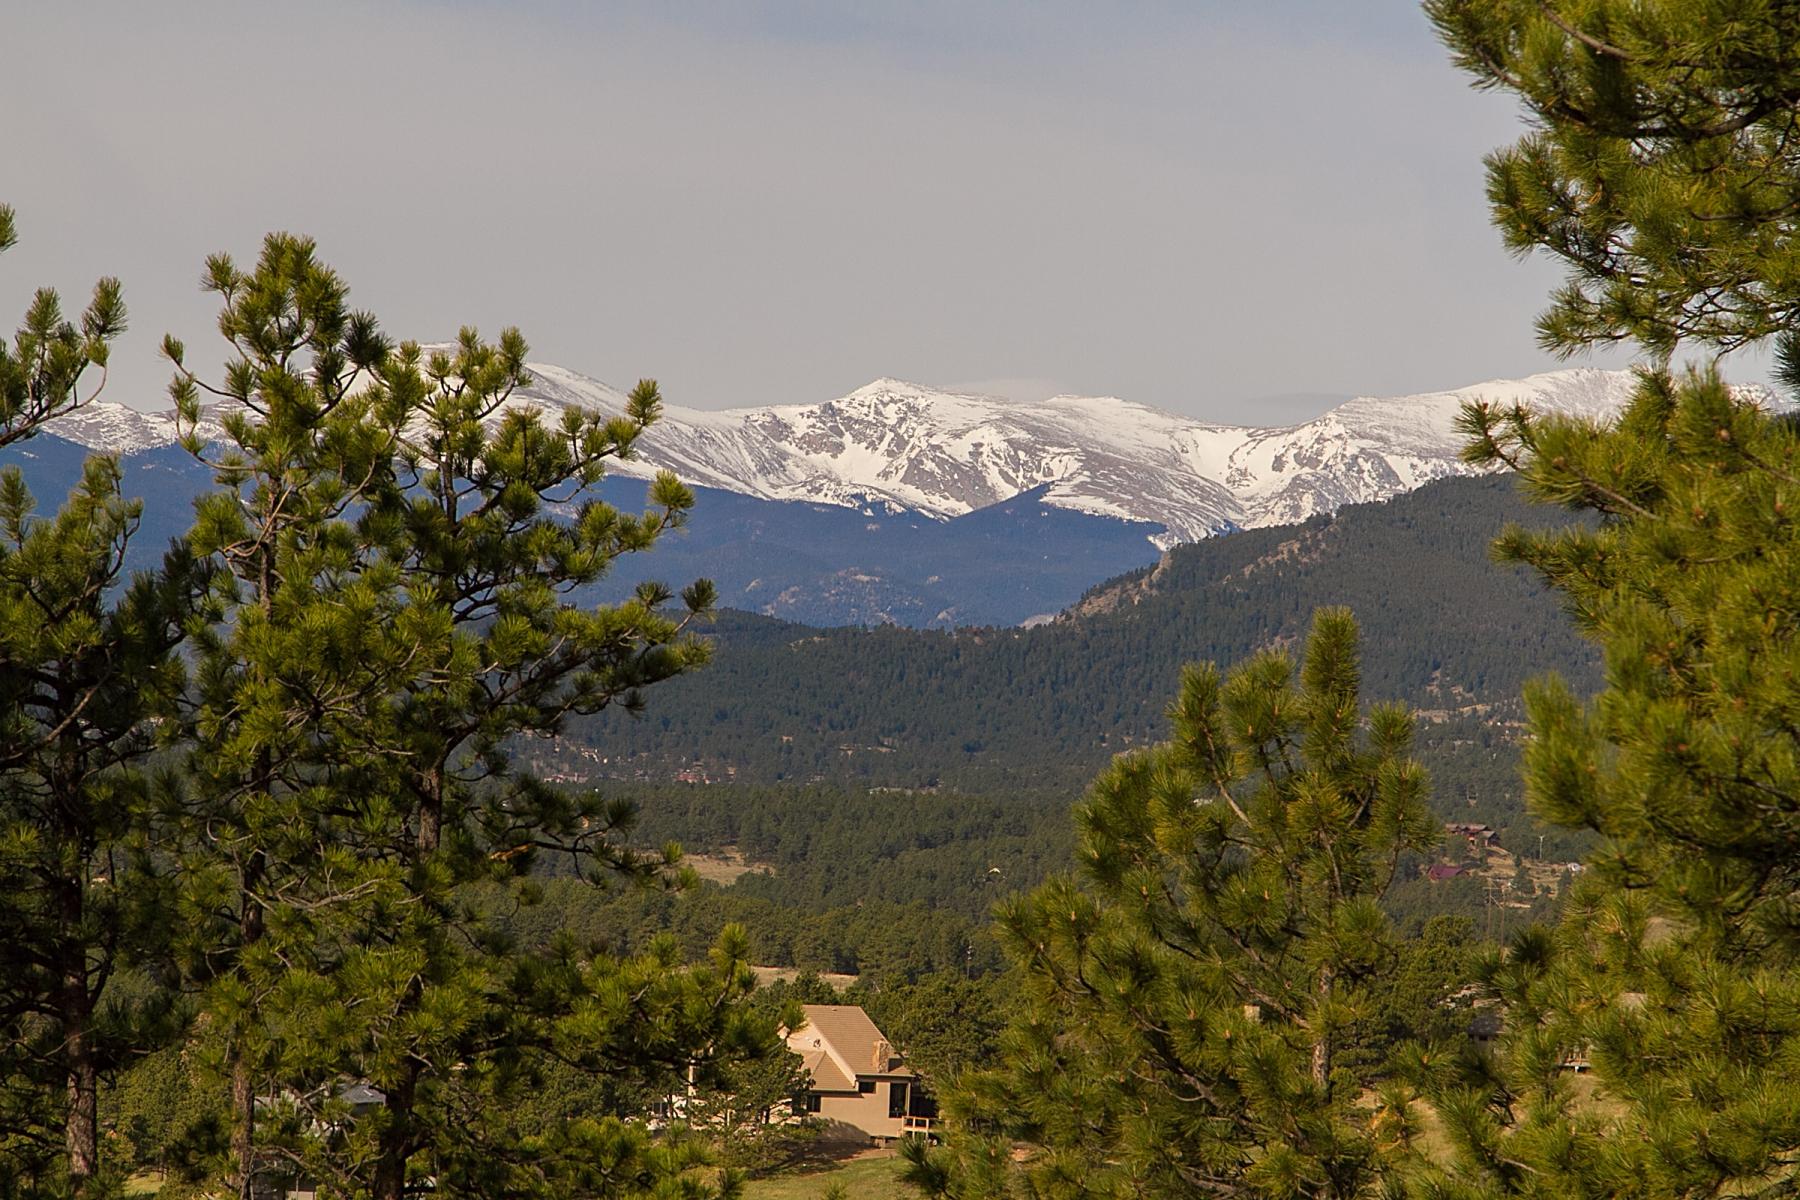 Property For Sale at Snow Cap Mount Evans Views!